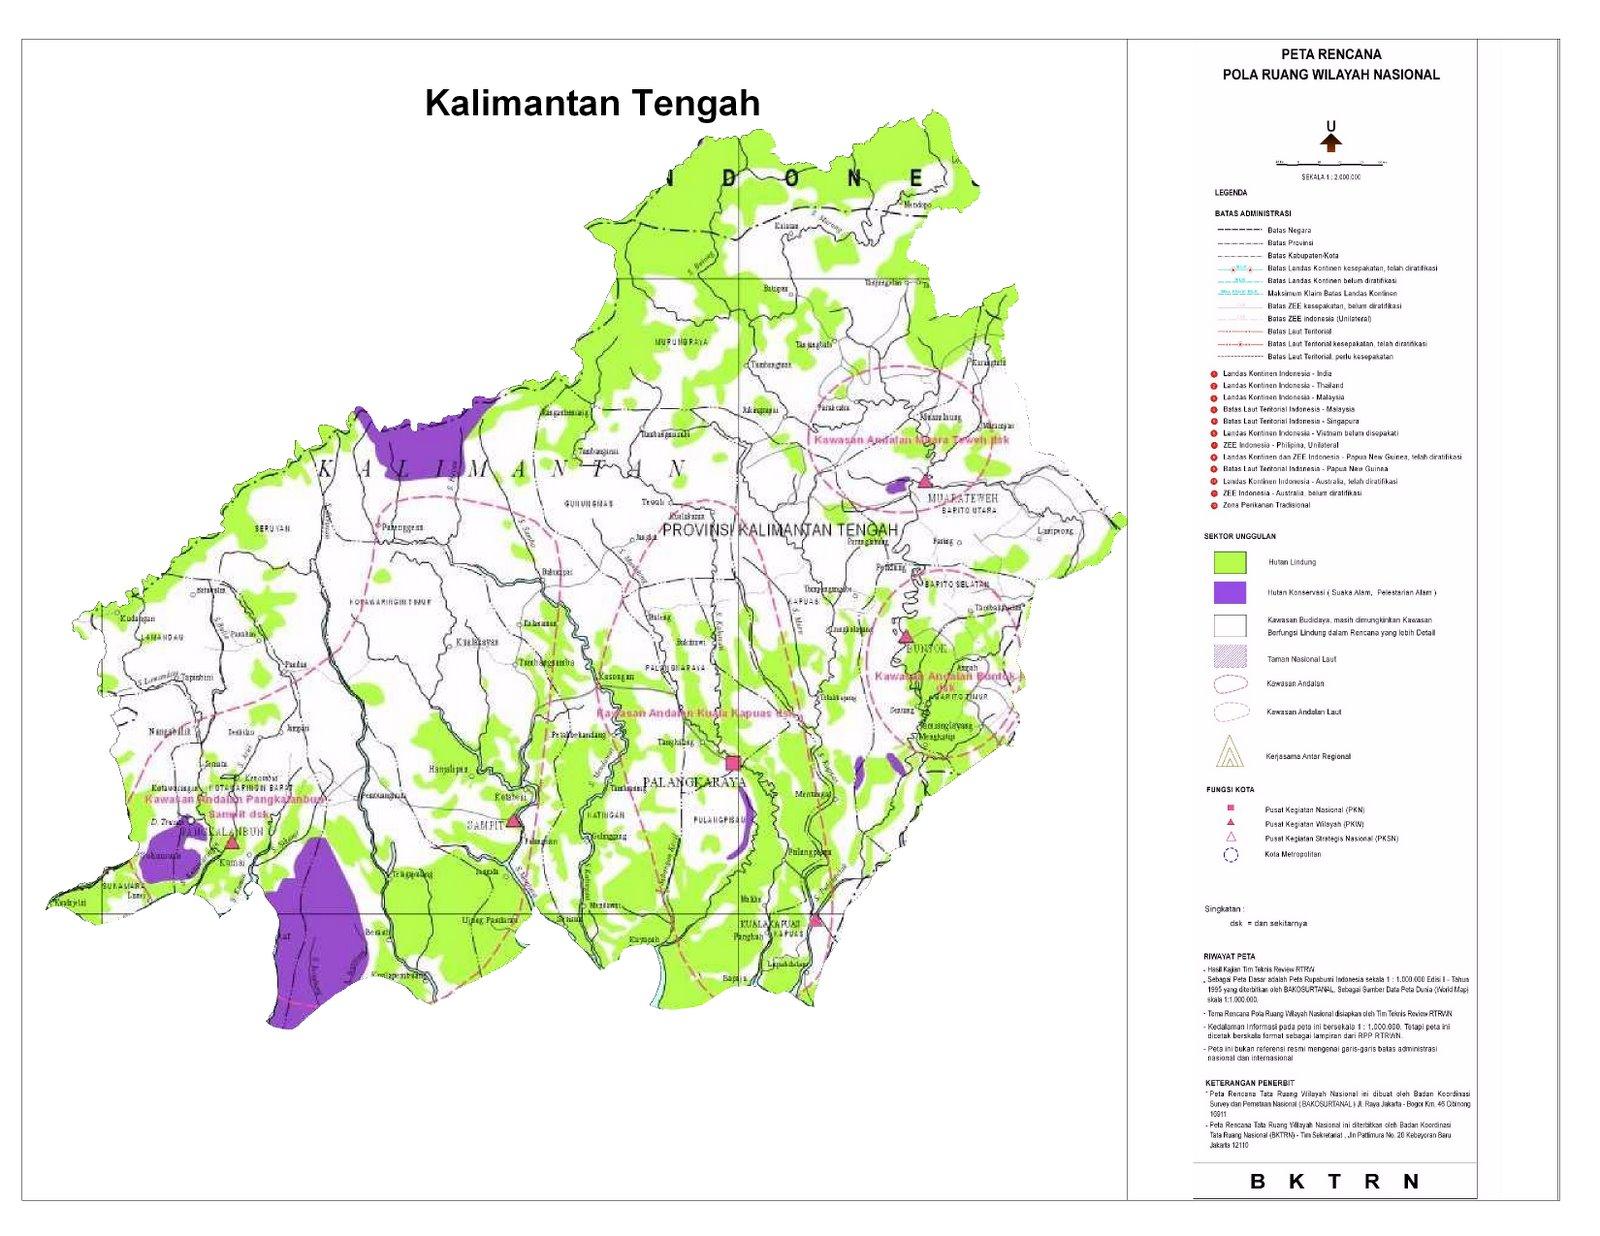 Proyeksi RTWN Terhadap Provinsi Kalimantan Tengah